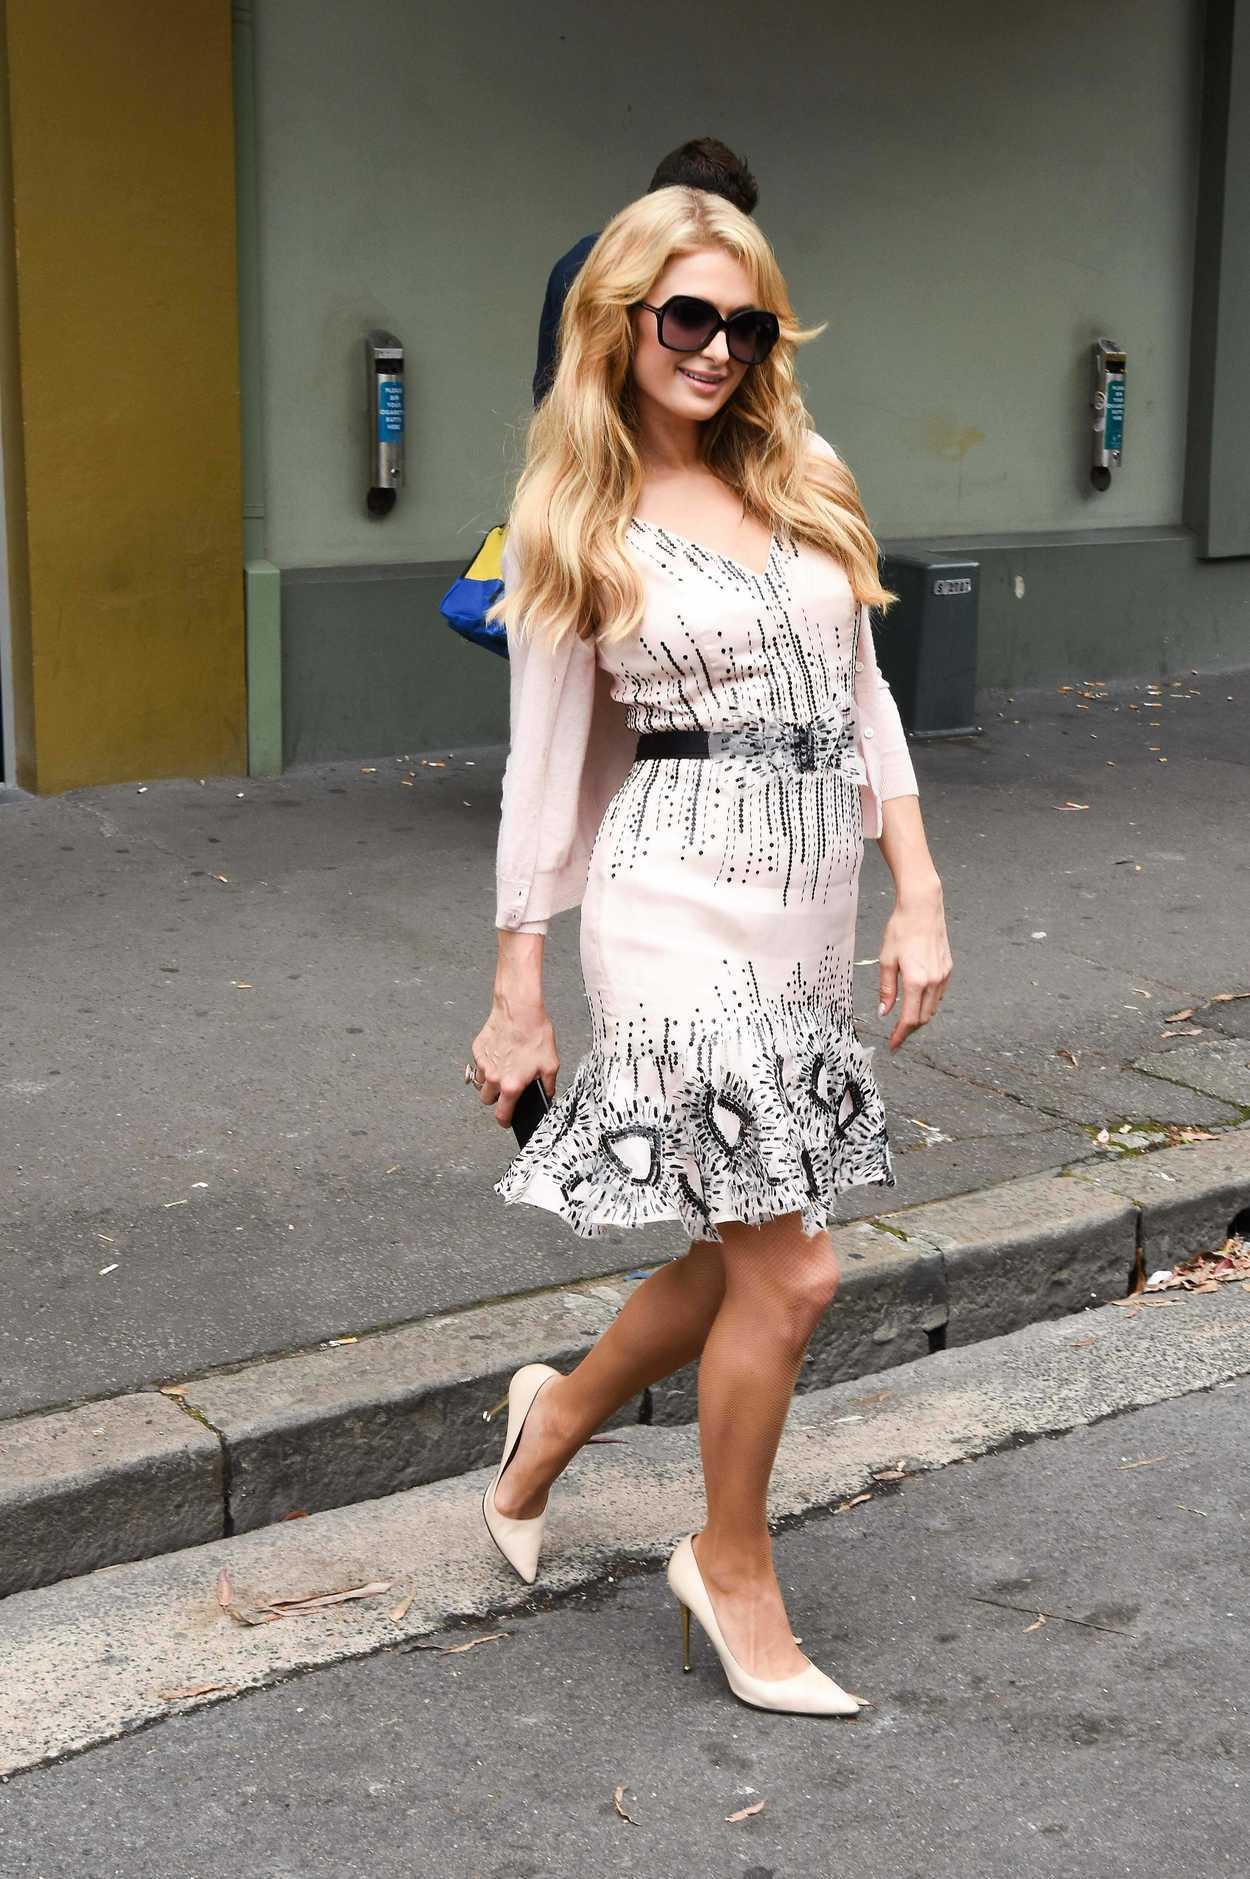 Paris hilton dating in Sydney